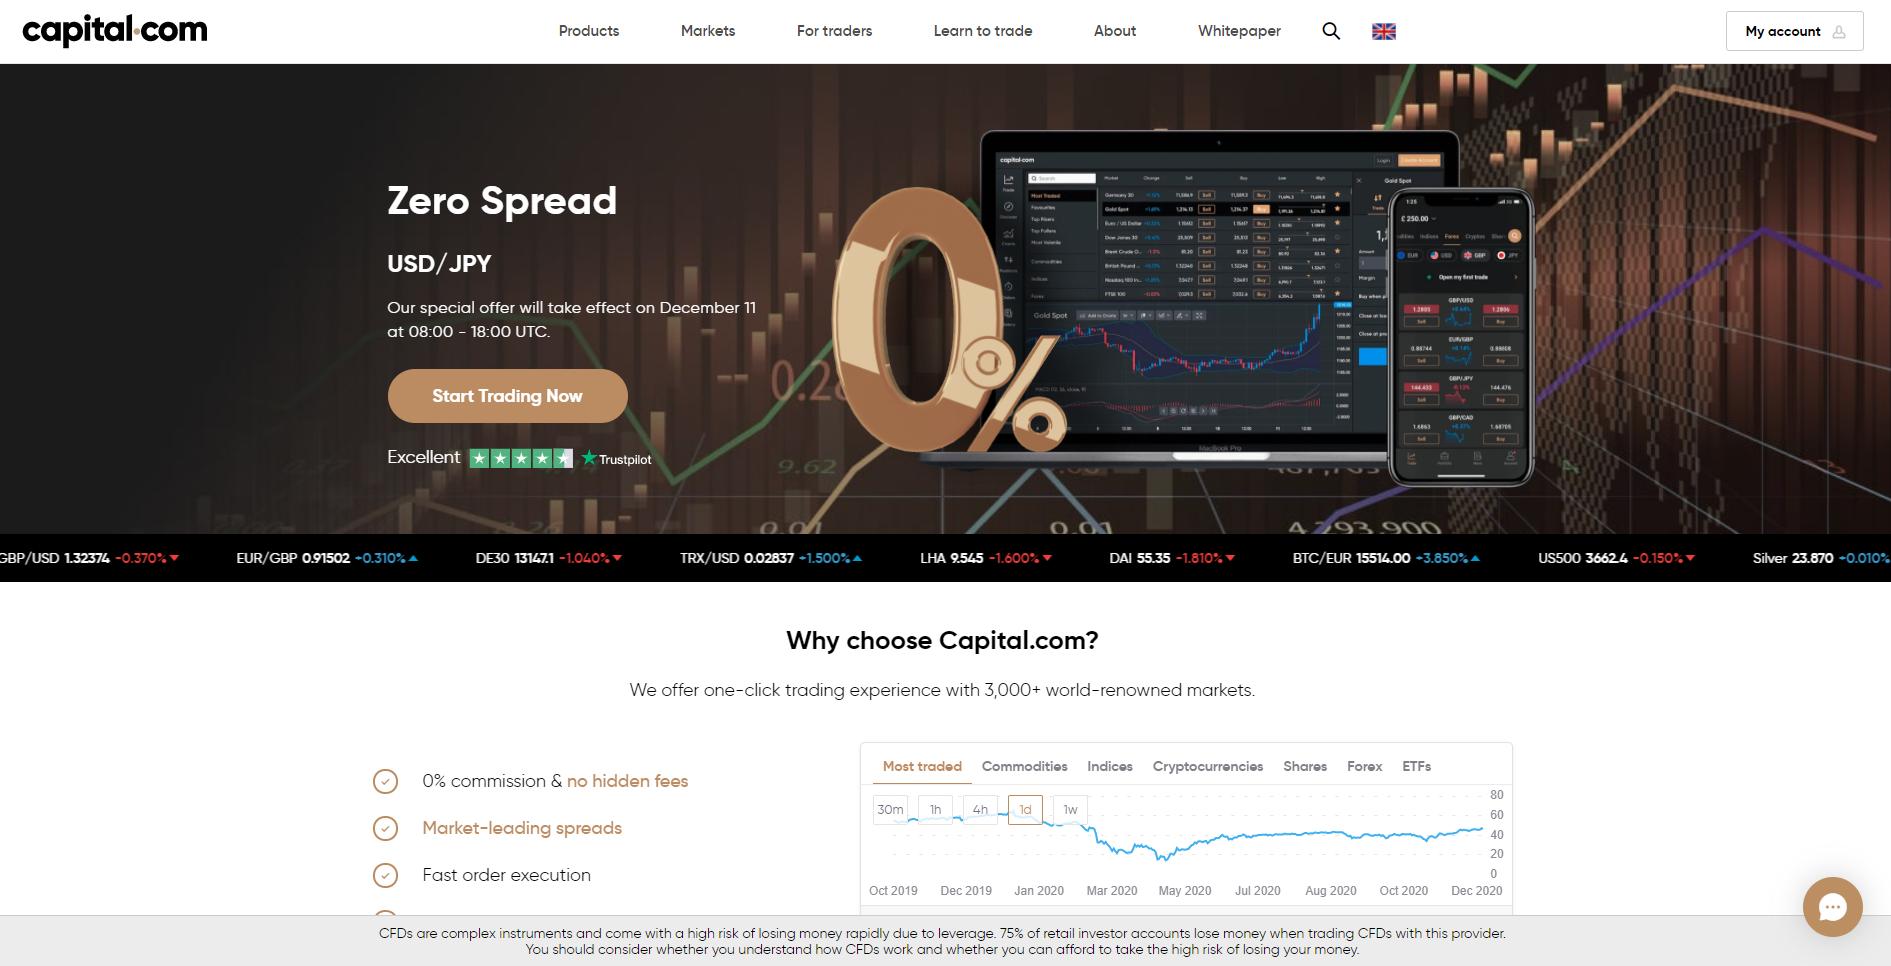 Capital.com आधिकारिक वेबसाइट